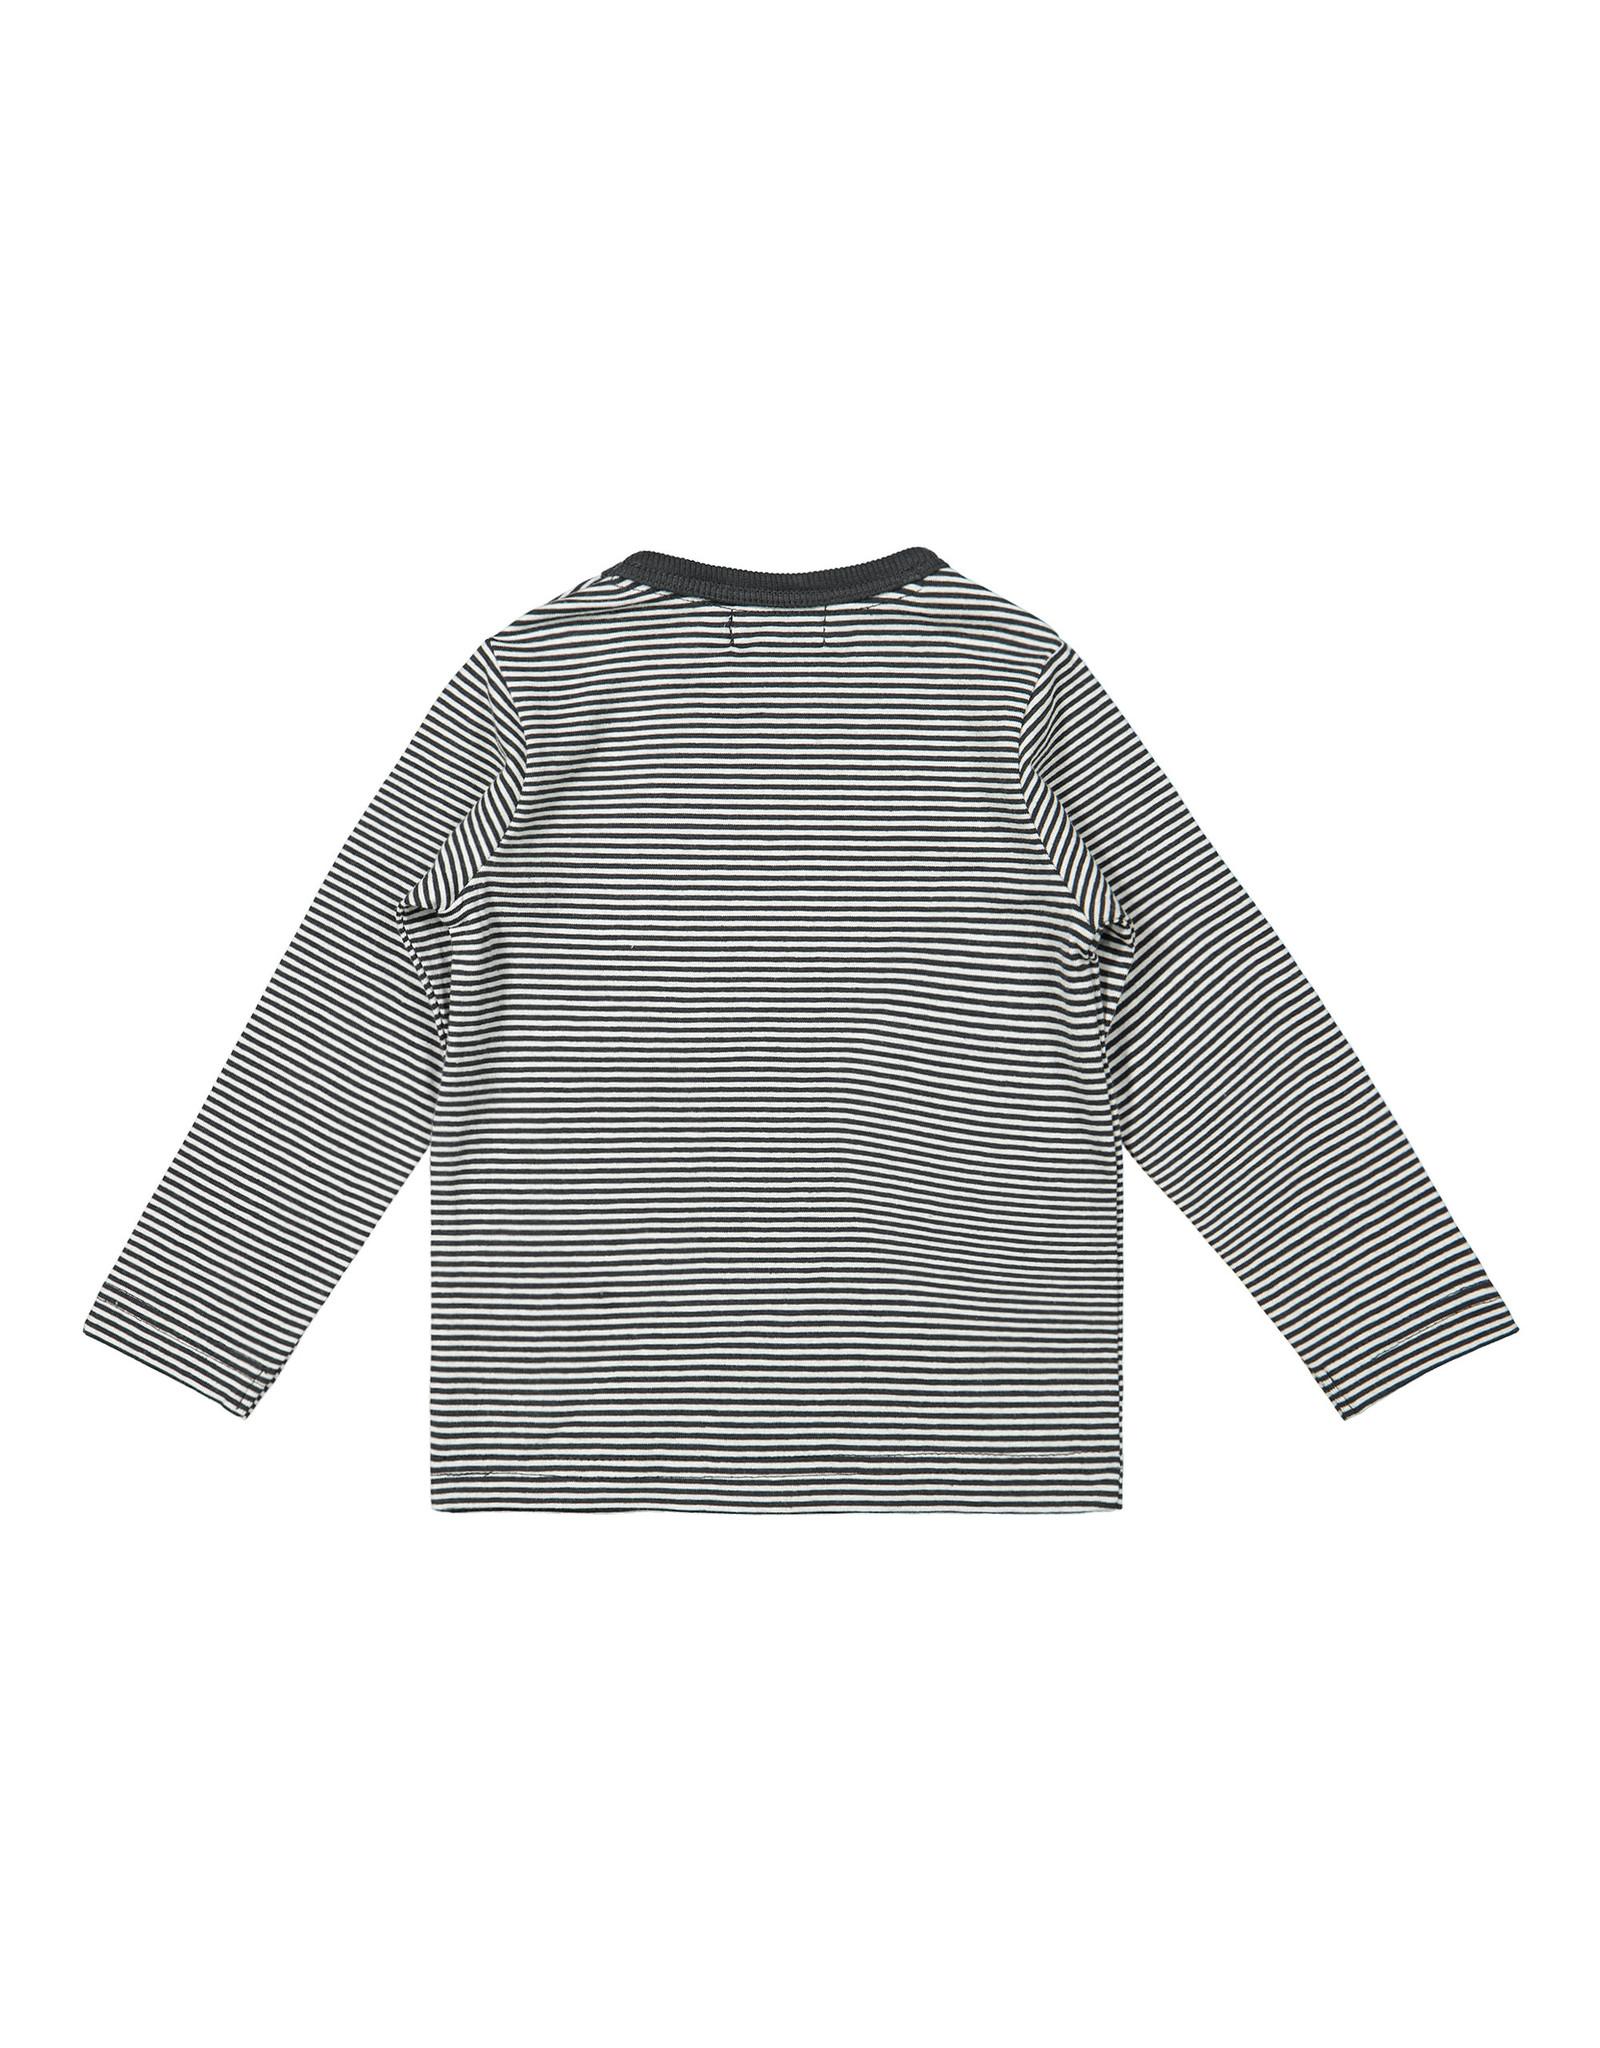 Dirkje Dirkje baby jongens shirt Lead the Other Anthrasite Off White Stripe